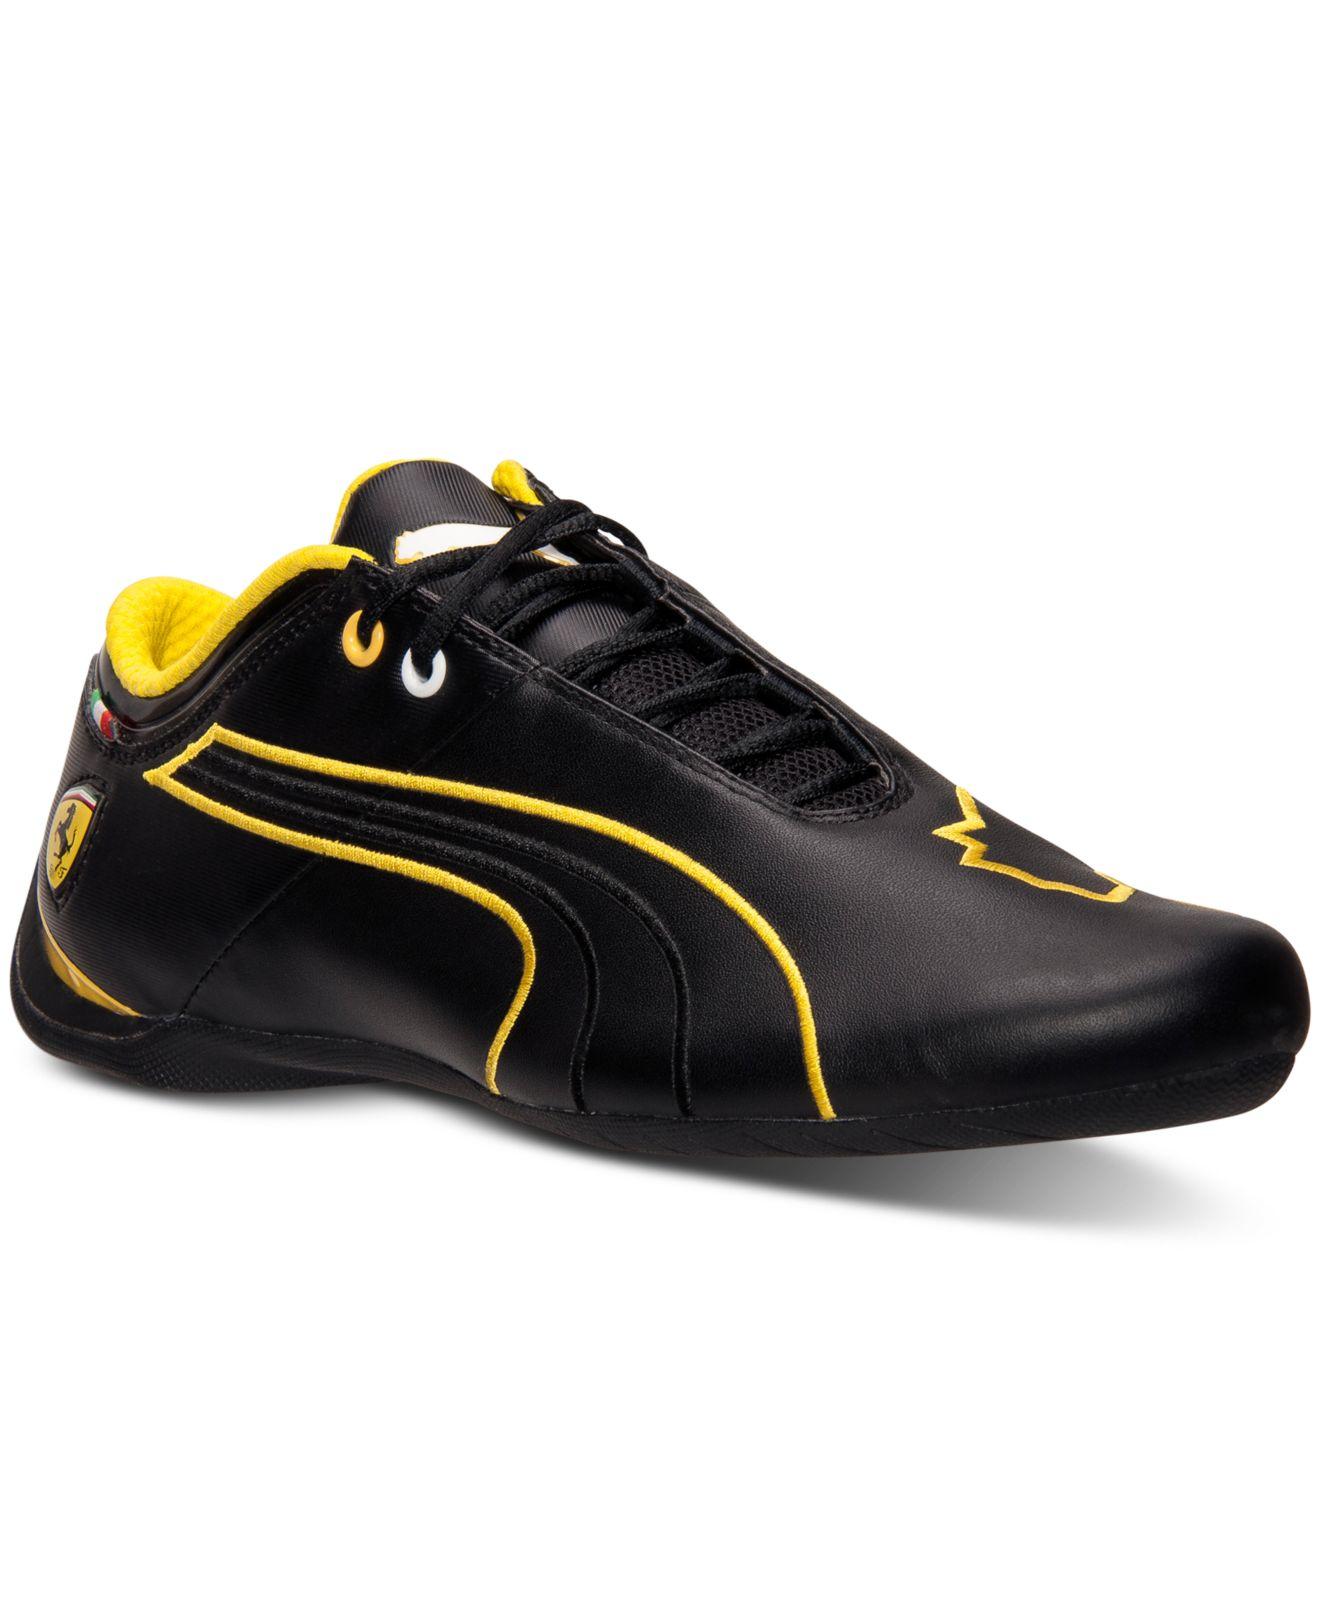 dec4d20d61627a Lyst - PUMA Men s Future Cat M1 Sf Ferrari Casual Sneakers From ...